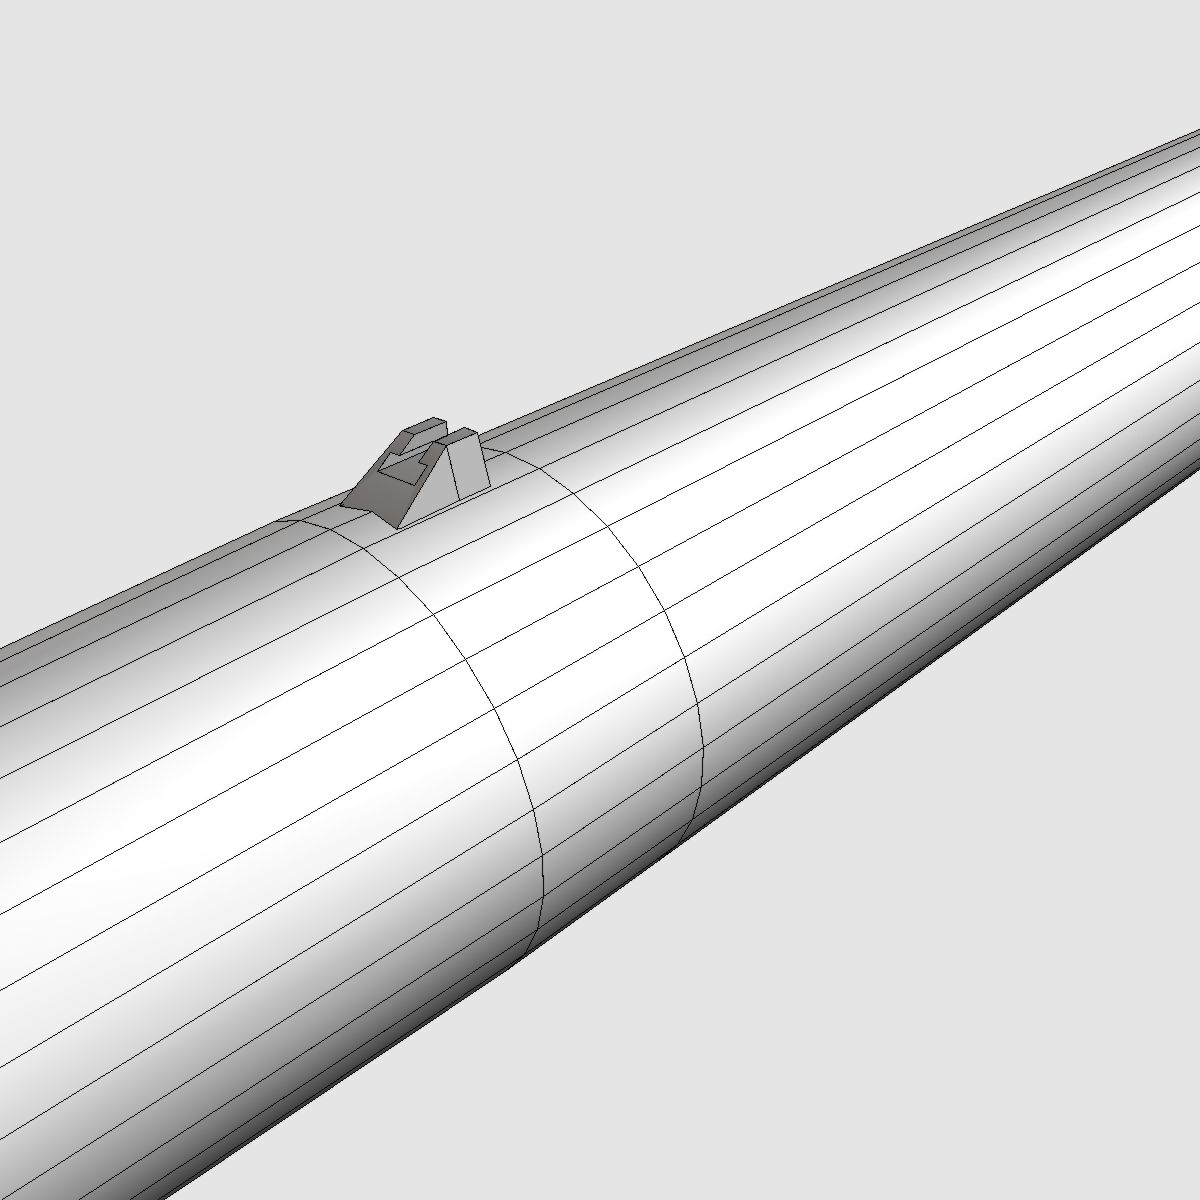 black brant vb sounding rocket 3d model 3ds dxf cob x obj 150880